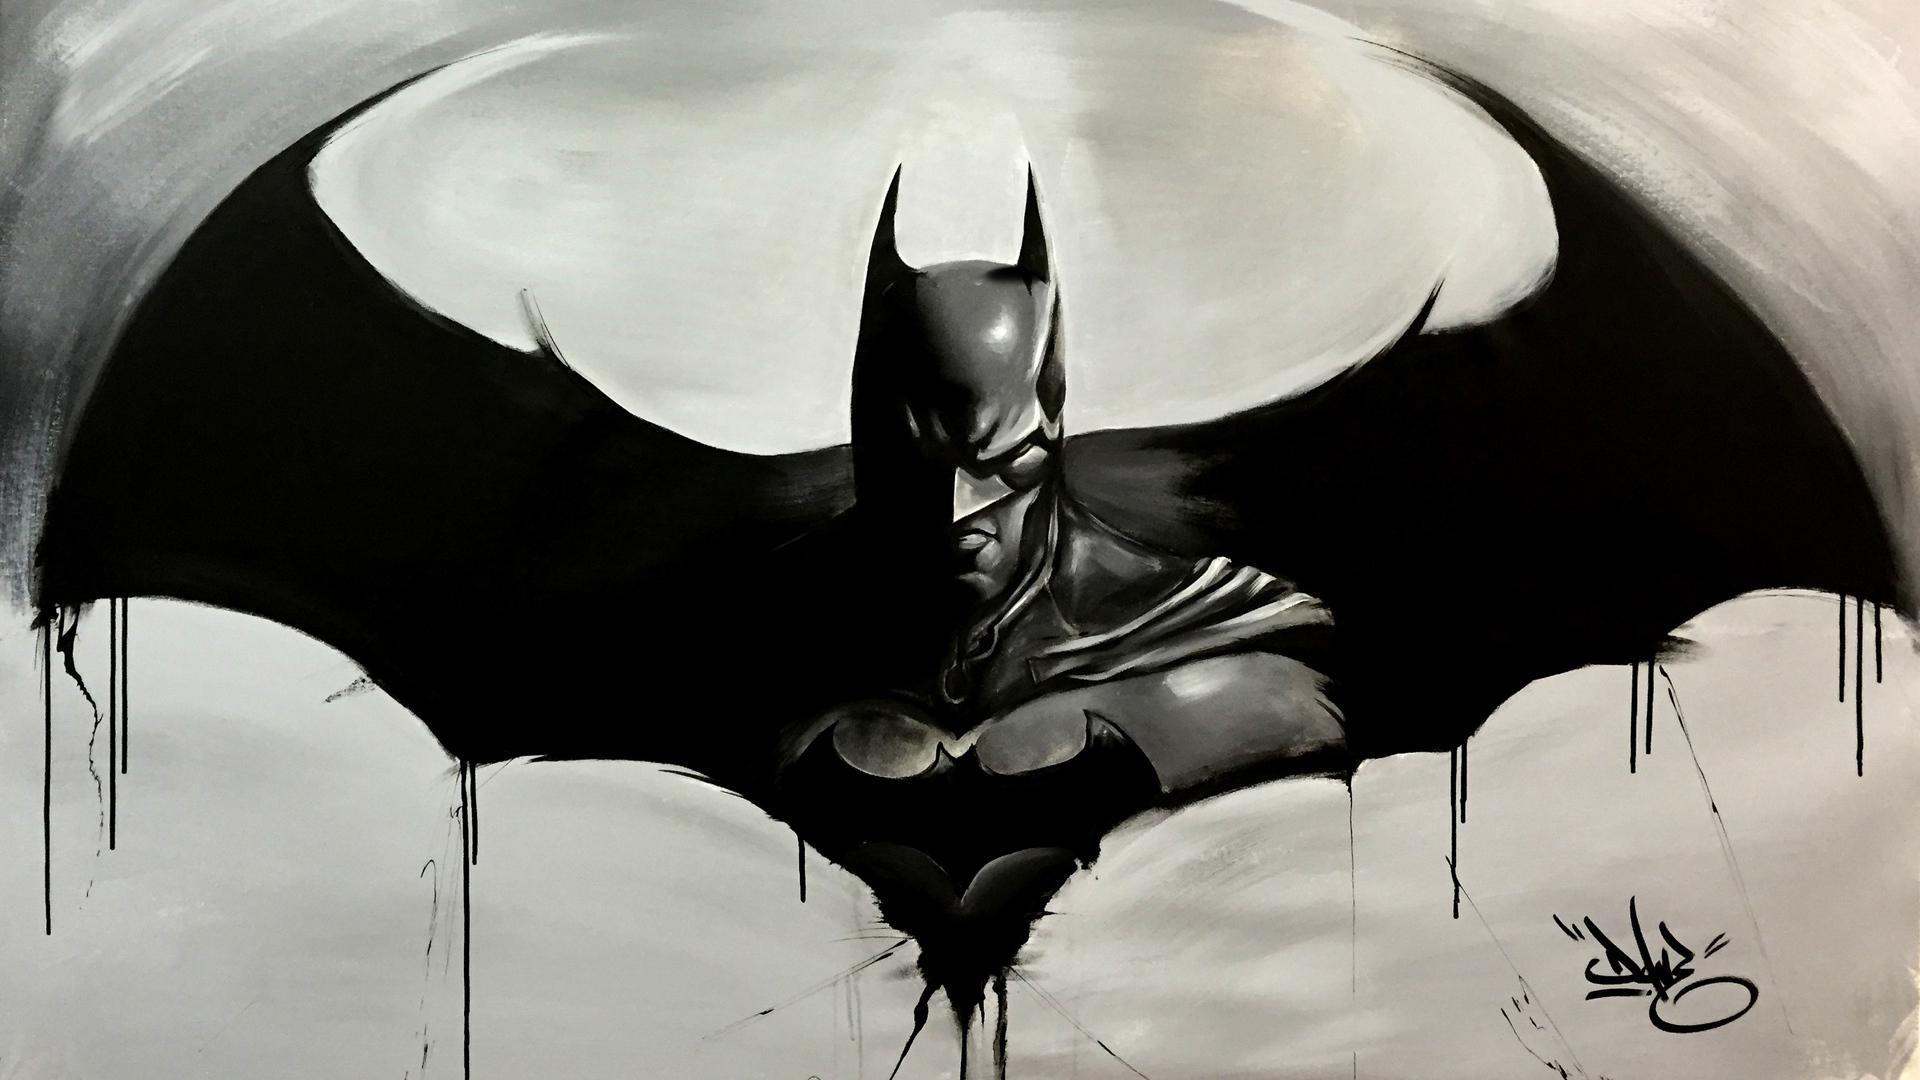 1920x1080 Batman Logo Sketch Art Laptop Full Hd 1080p Hd 4k